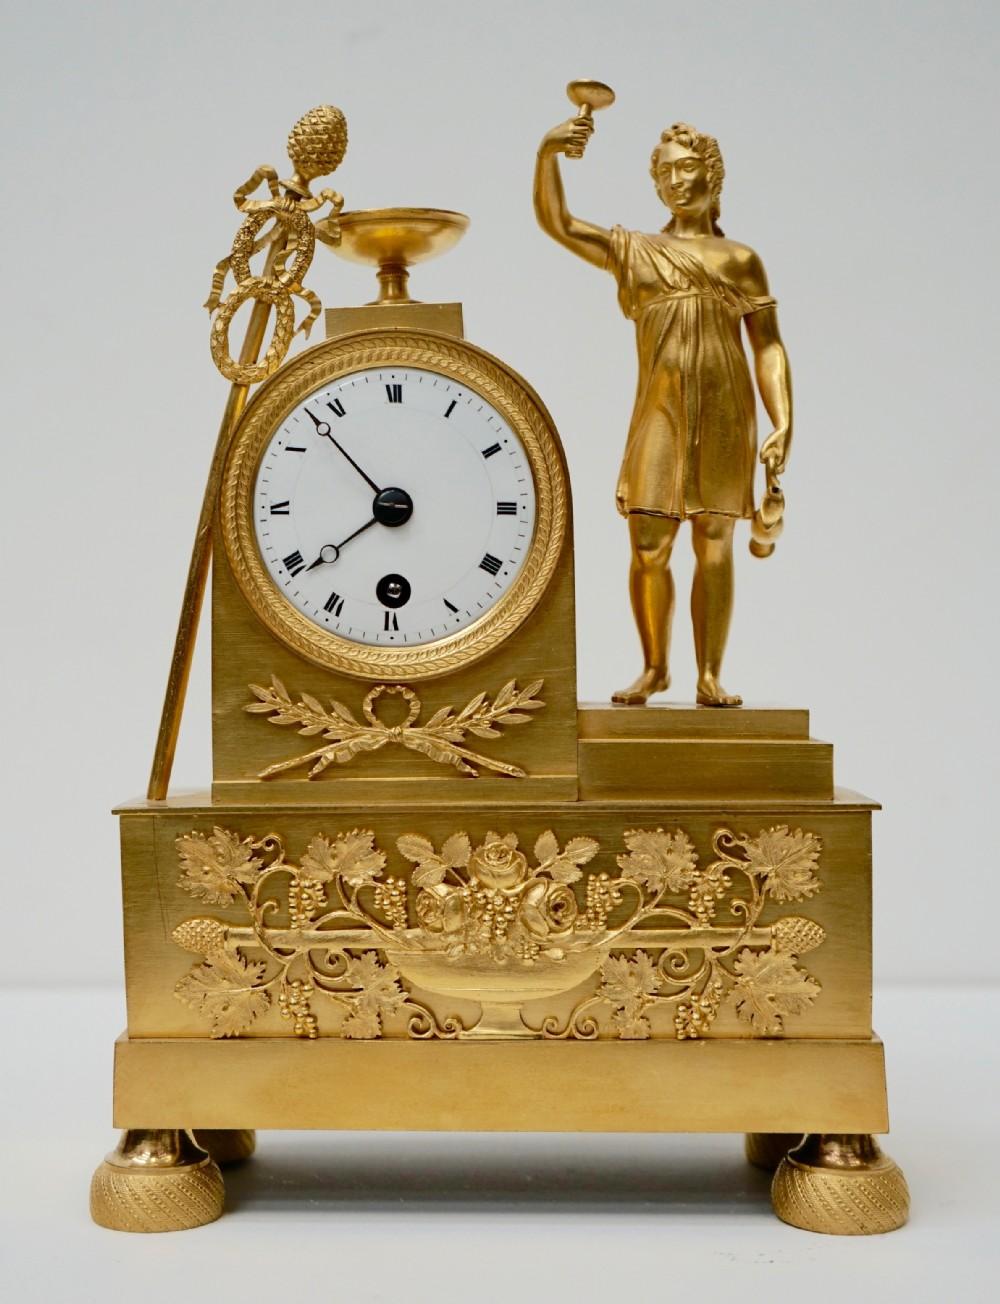 french ormolu wine related mantel clock